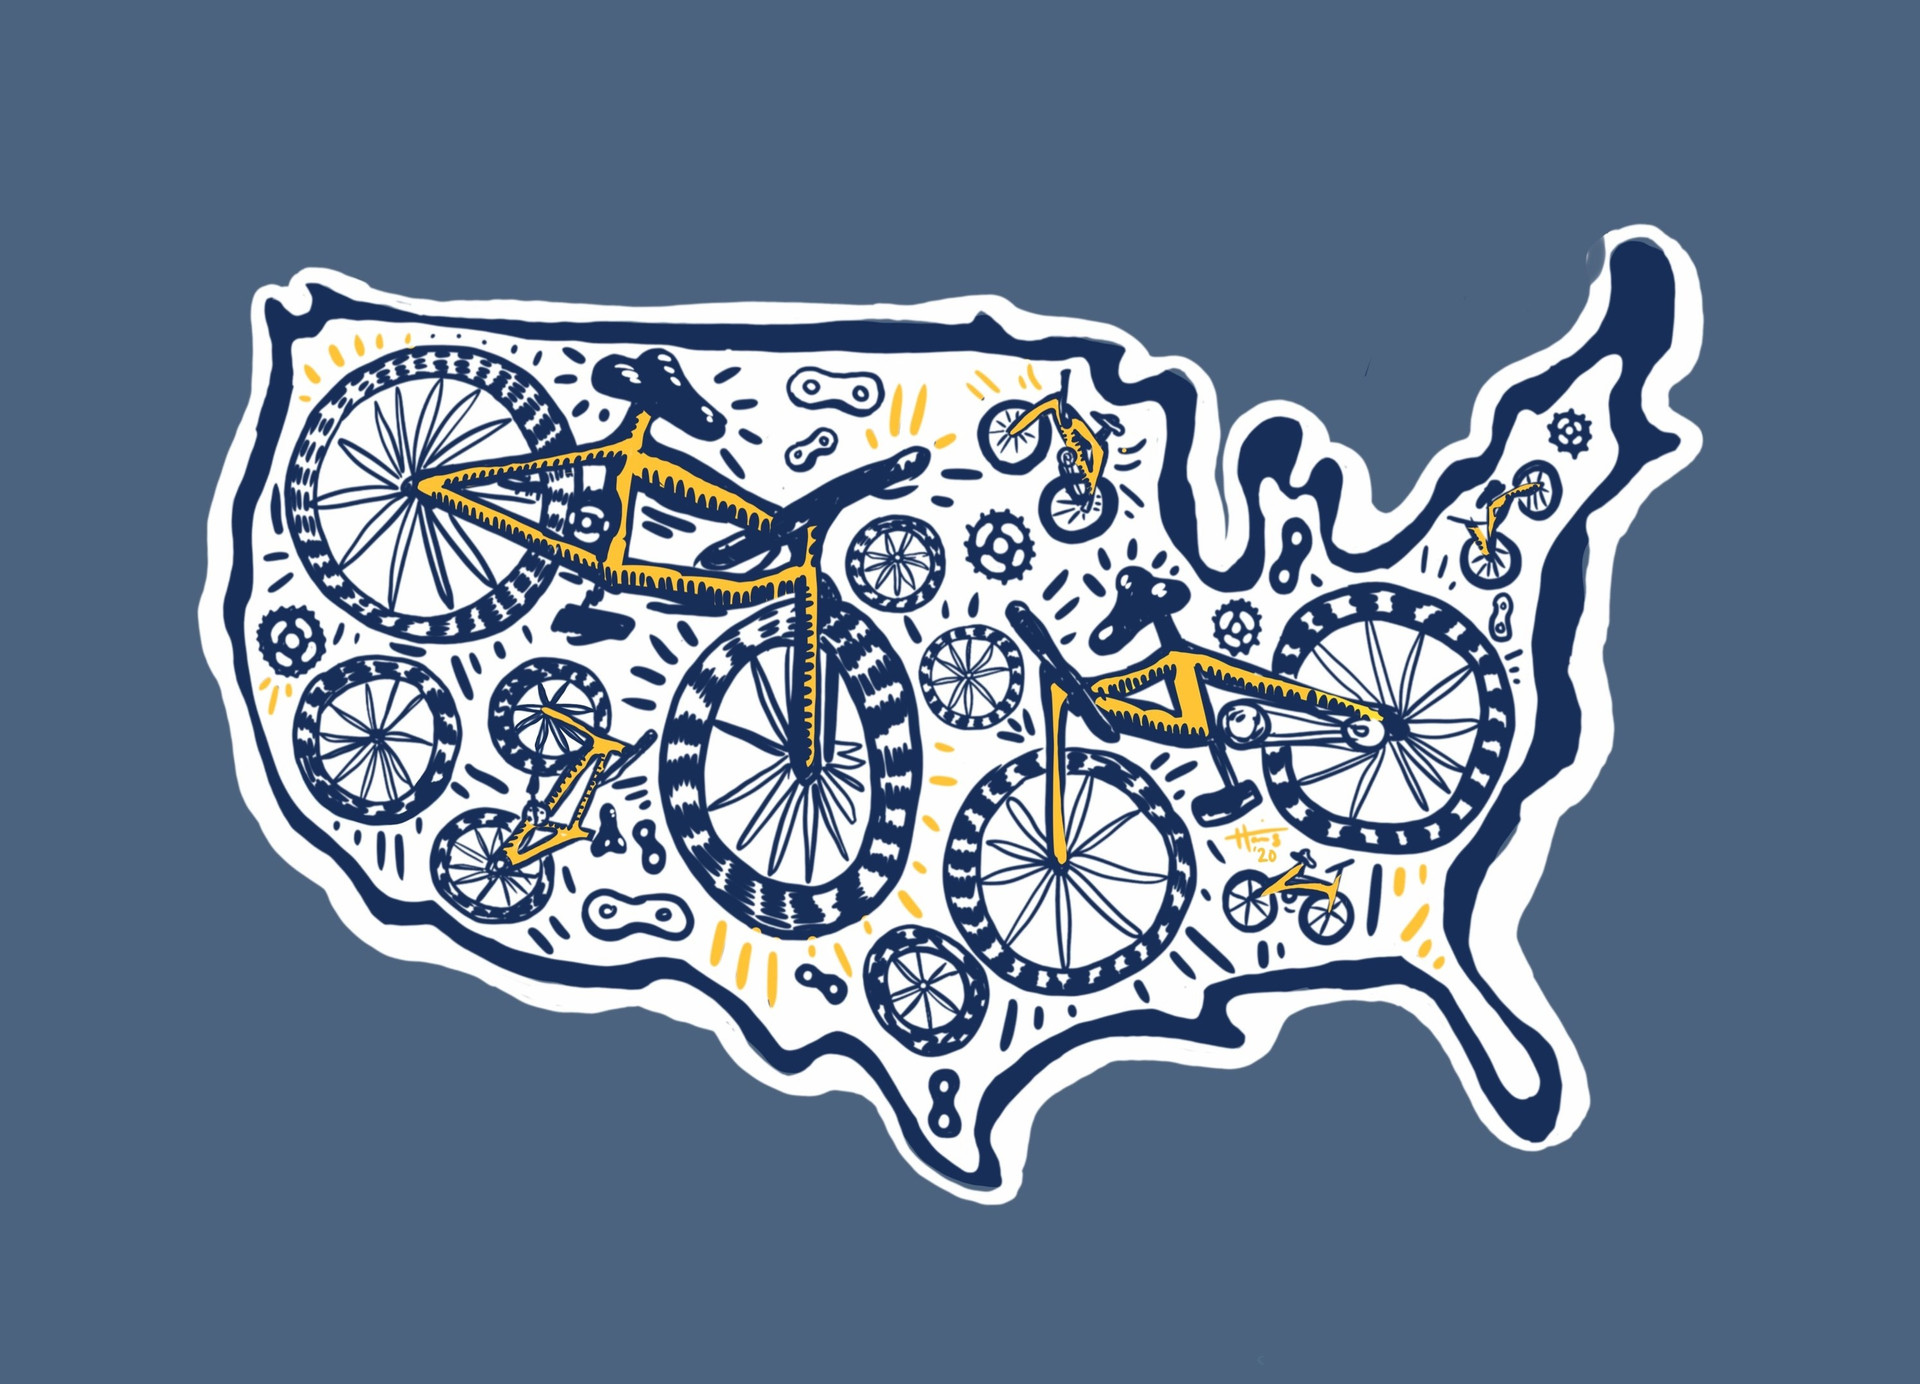 2020 Wilderness Voyageurs bike tour shirt design